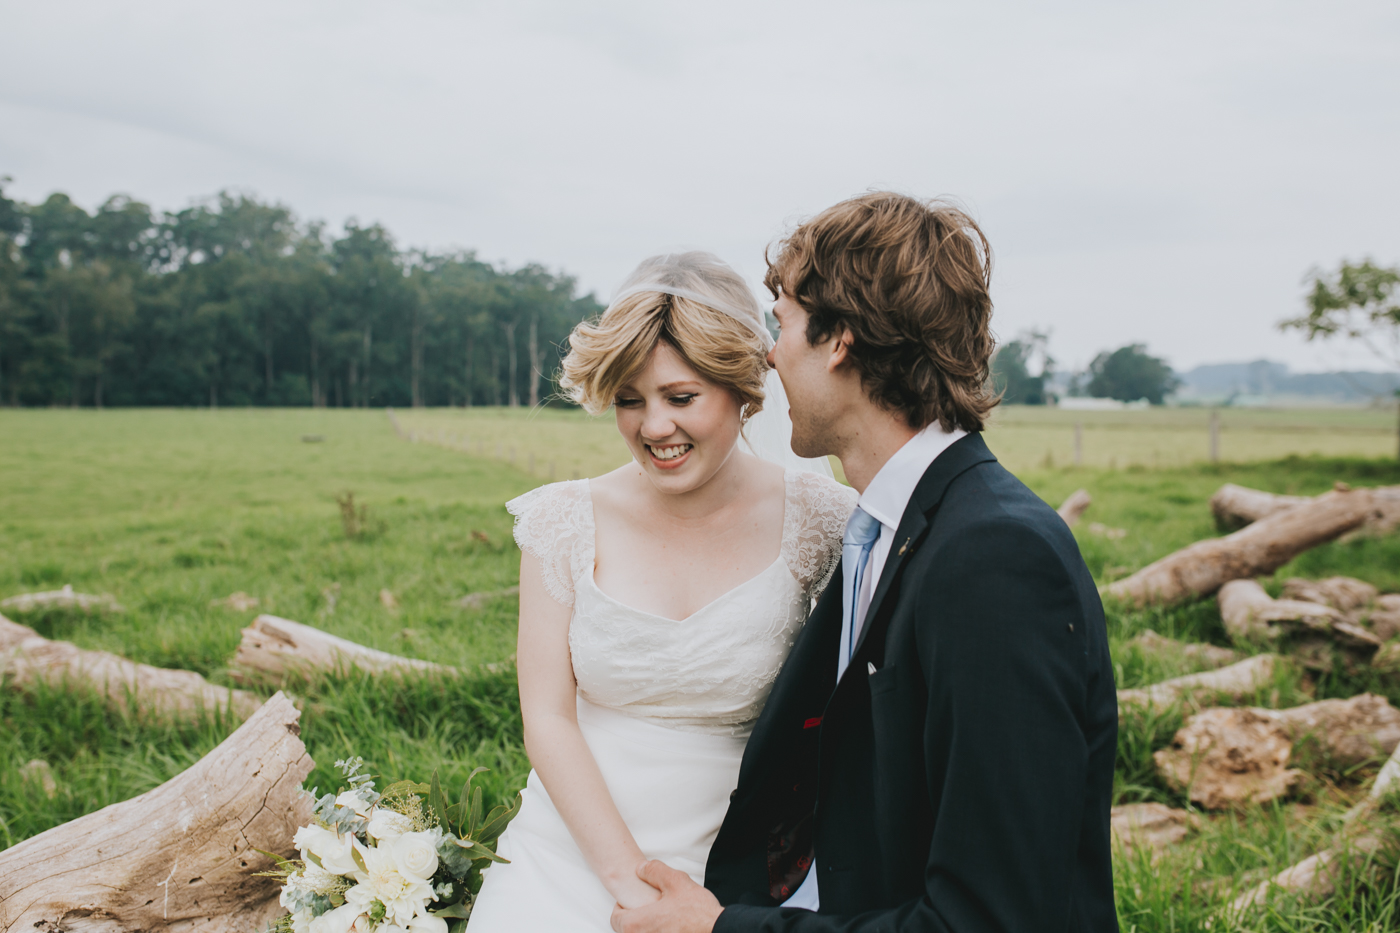 Rachel & Jacob - Willow Farm Berry - South Coast Wedding - Samantha Heather Photography-111.jpg